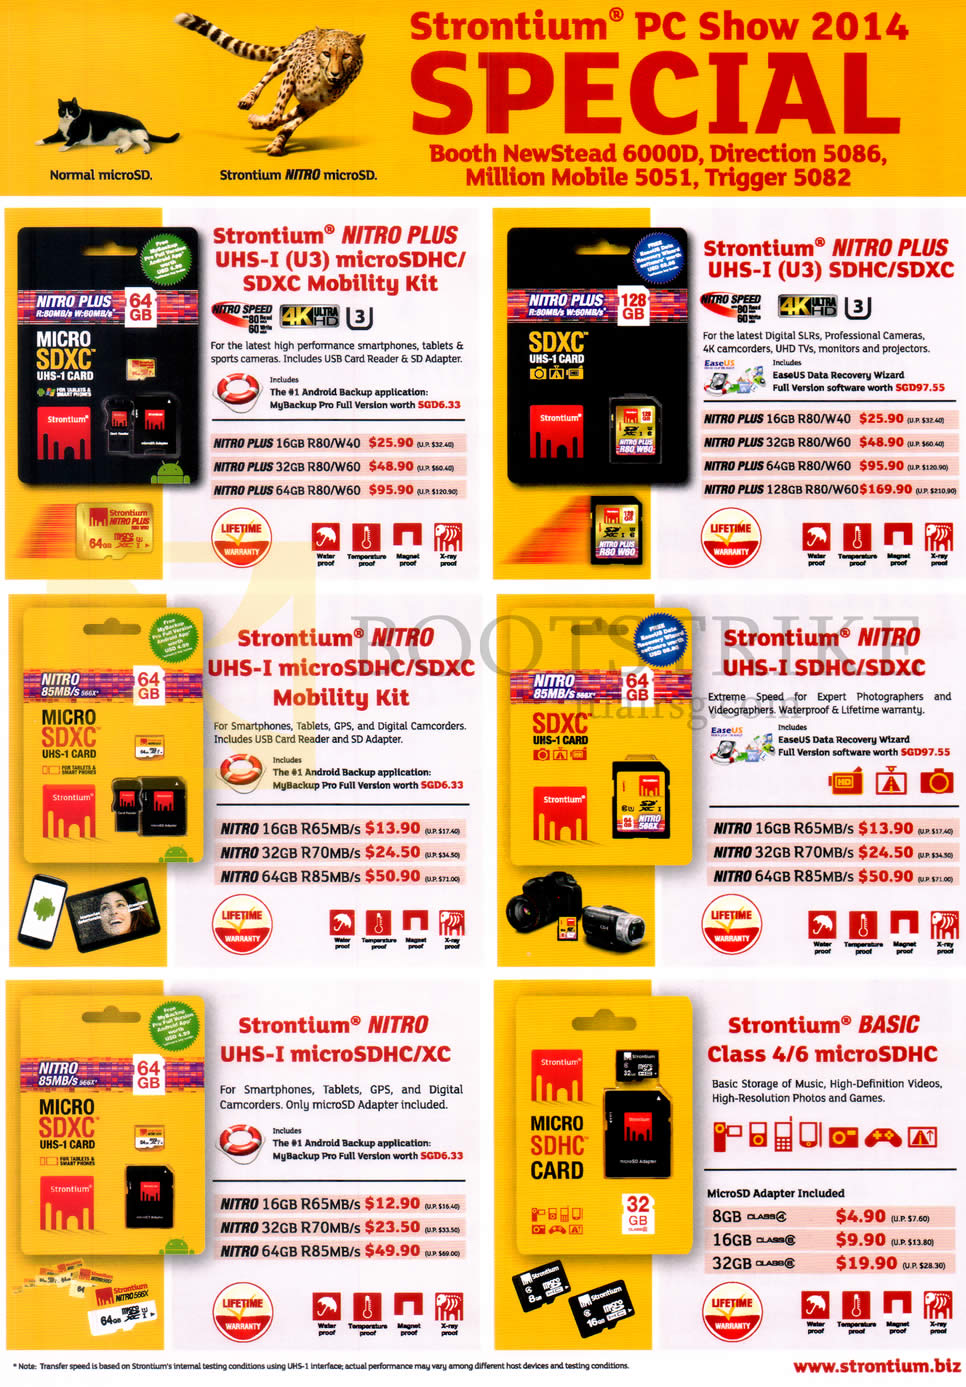 PC SHOW 2014 price list image brochure of Strontium Flash Memory Cards MicroSDHC, SDXC, Nitro Plus, Basic, UHS-I